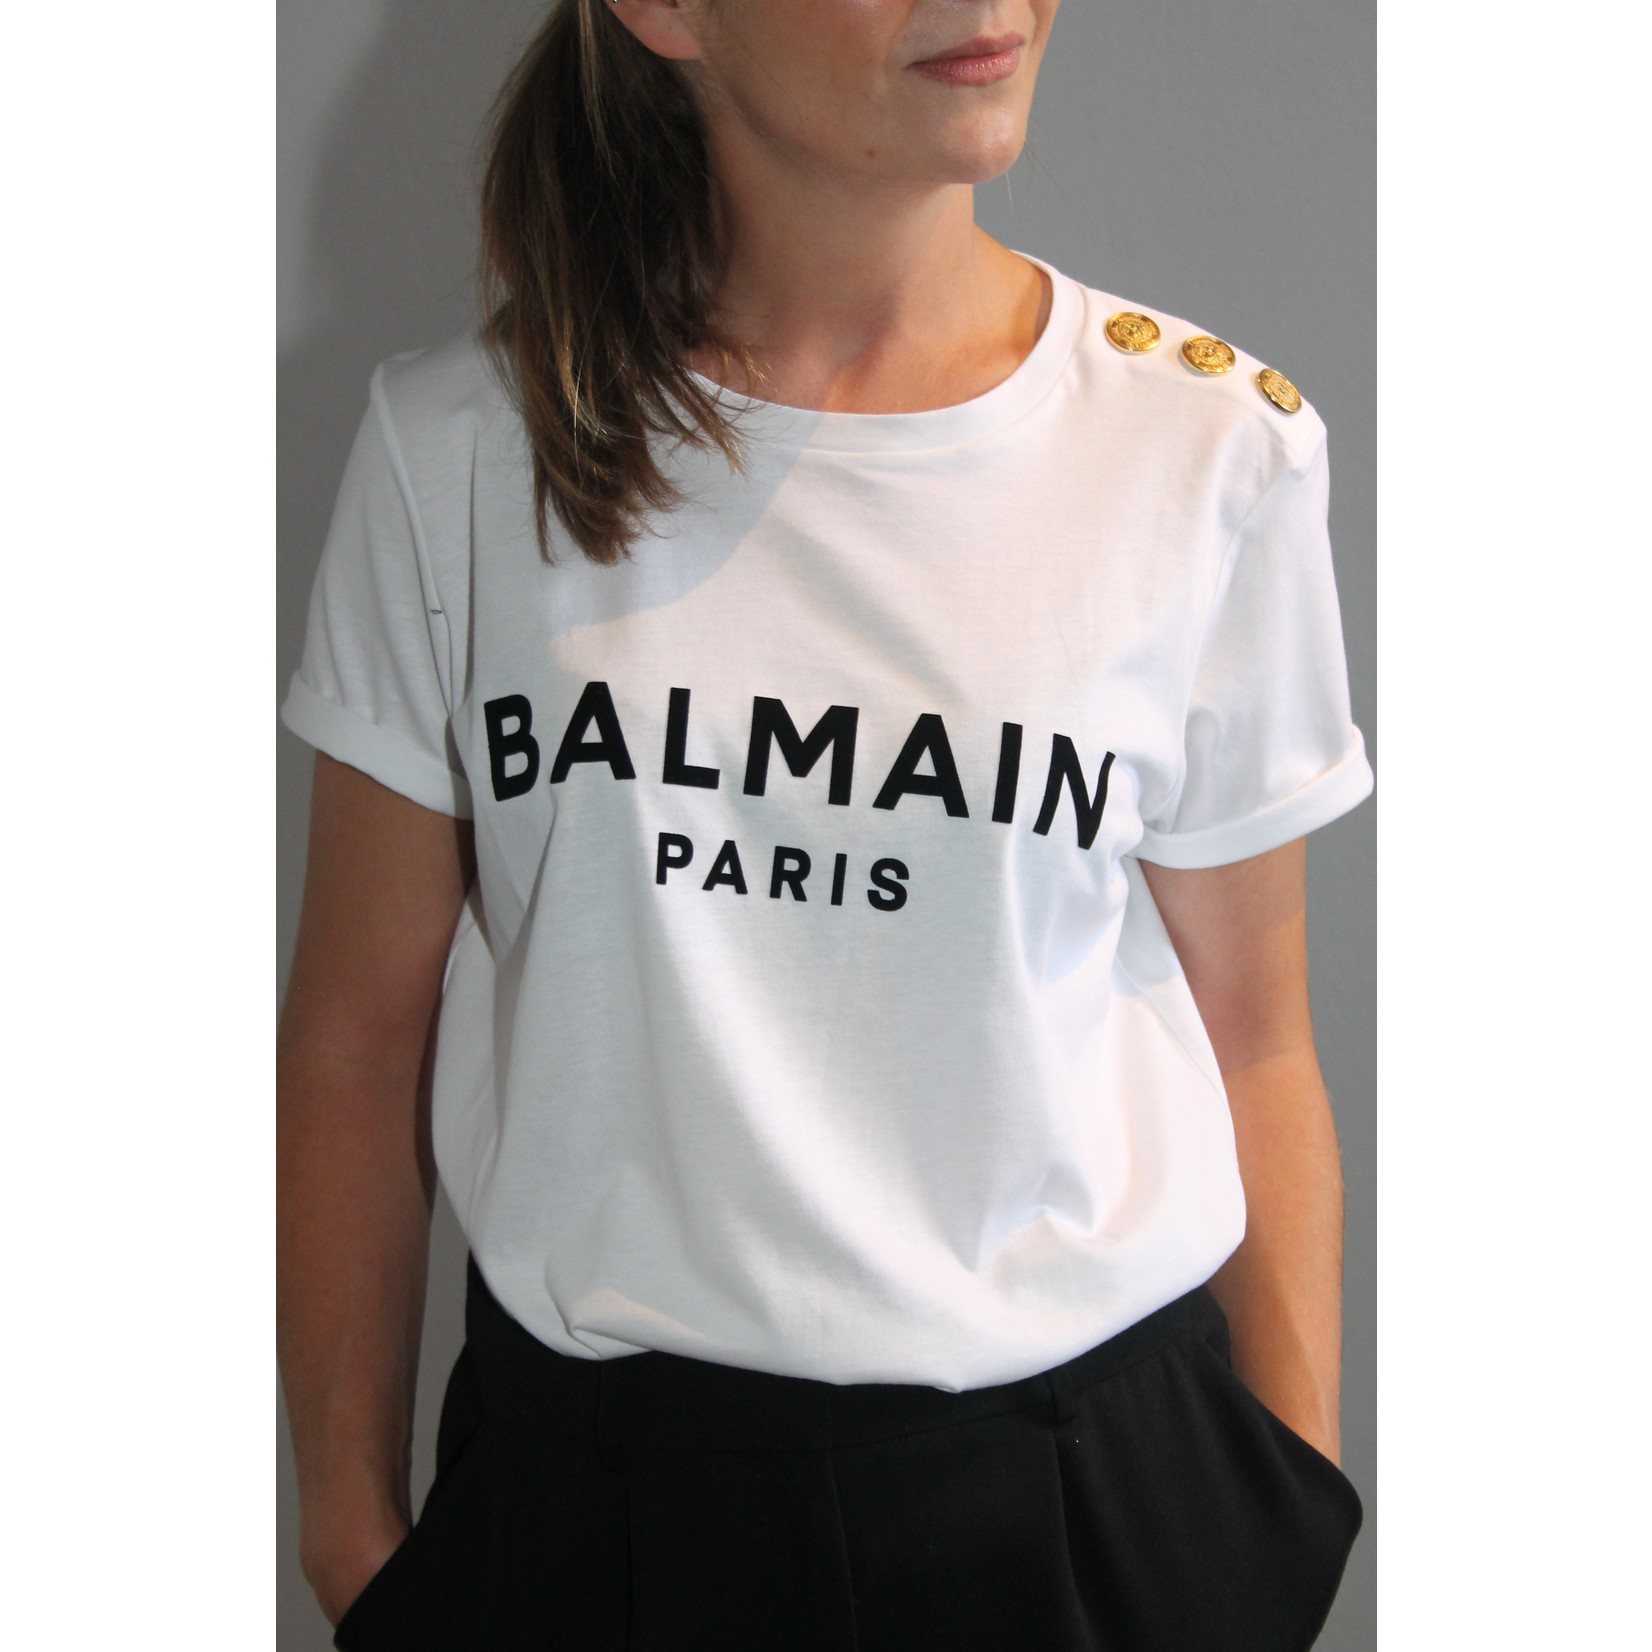 BALMAIN T-Shirt 42578